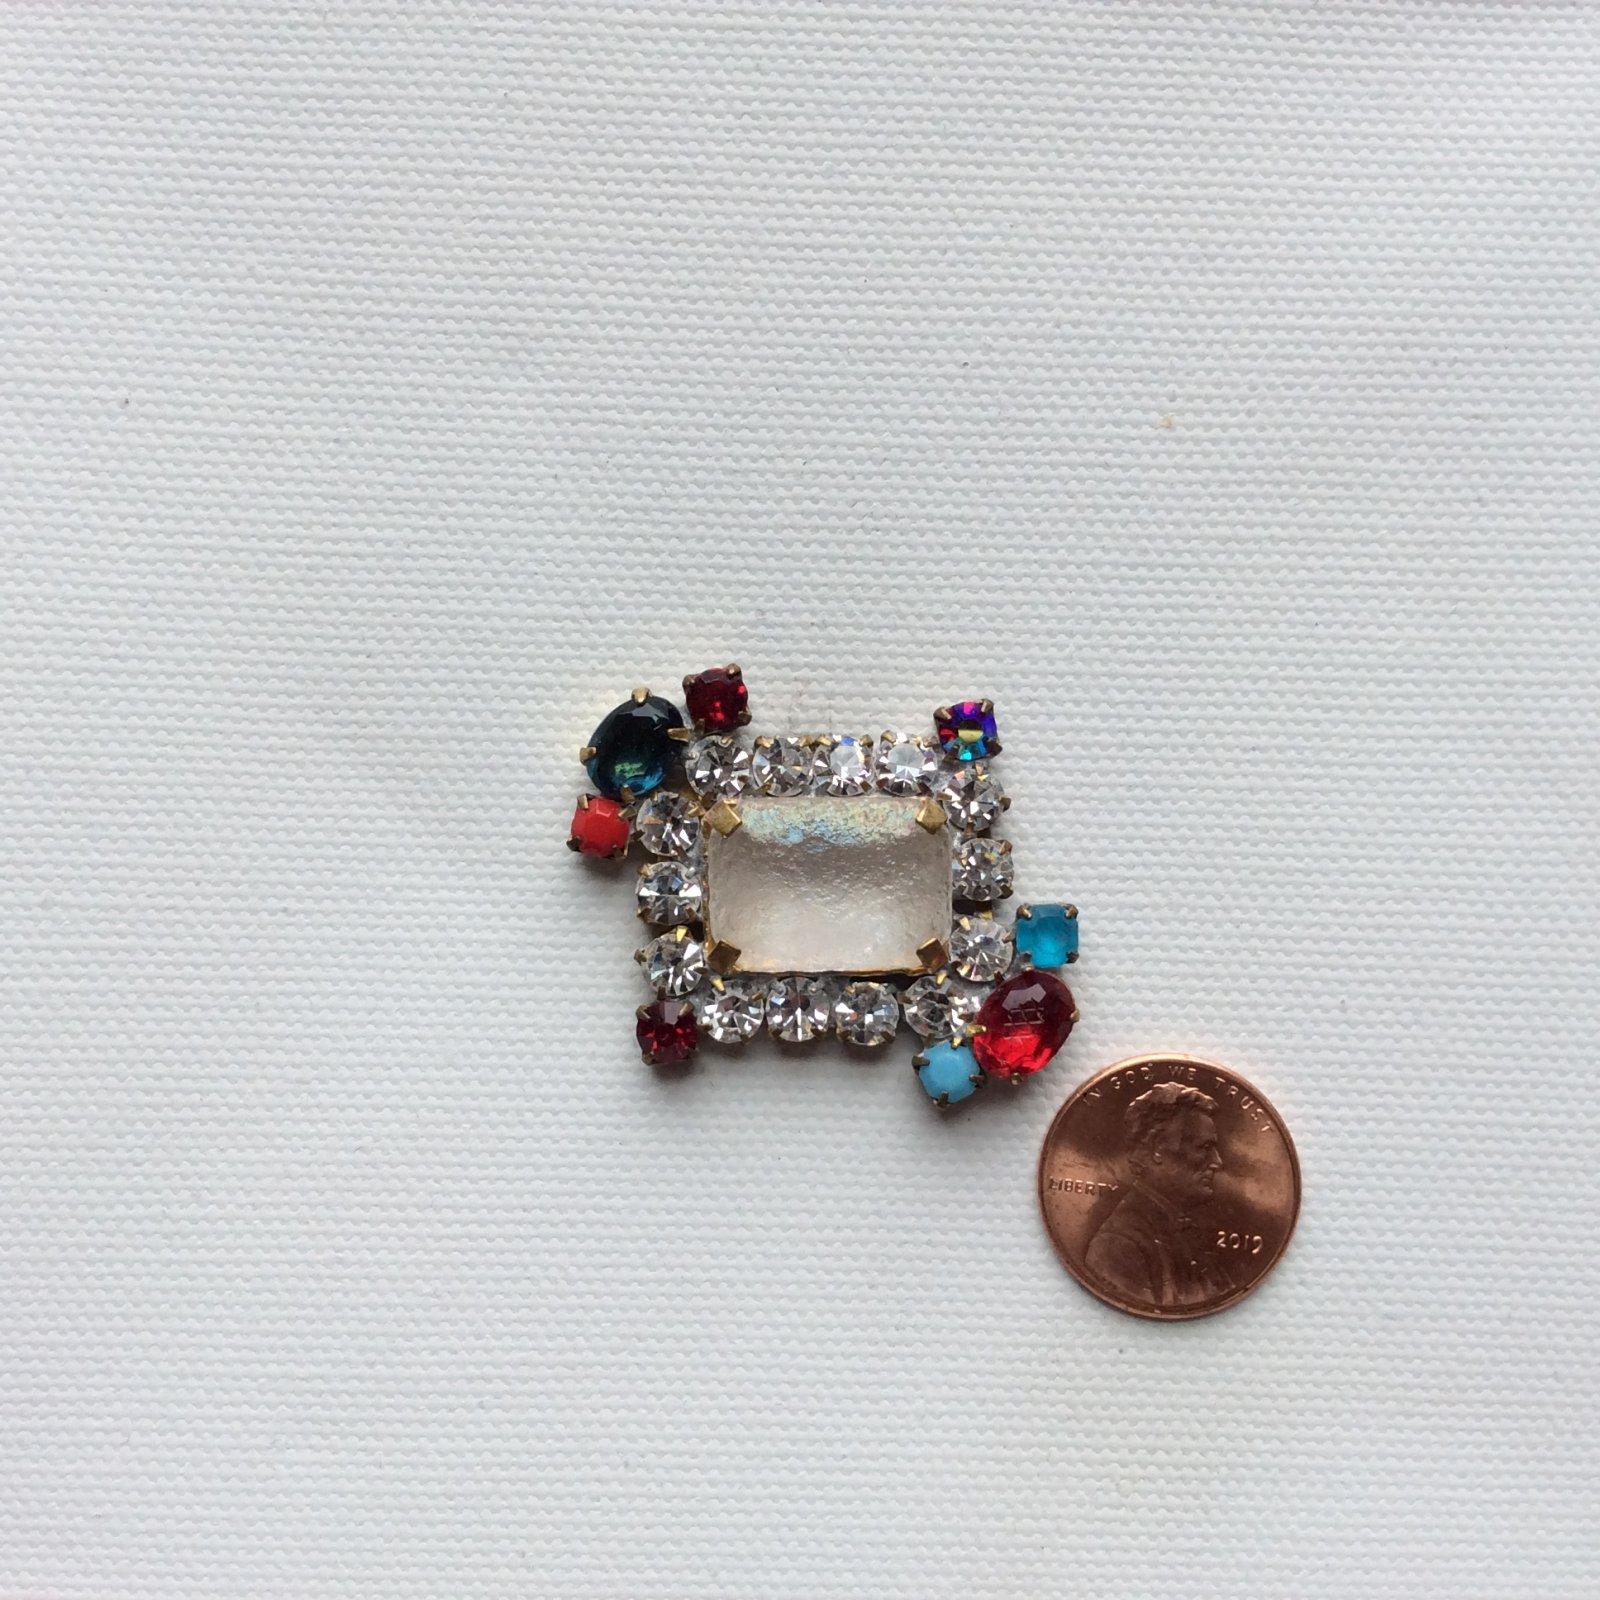 Vintage Czech Glass Rhinestone Jewelry Making Sew on Button Faceted Stone Decorative Costume Jewelry Pendant CZG033